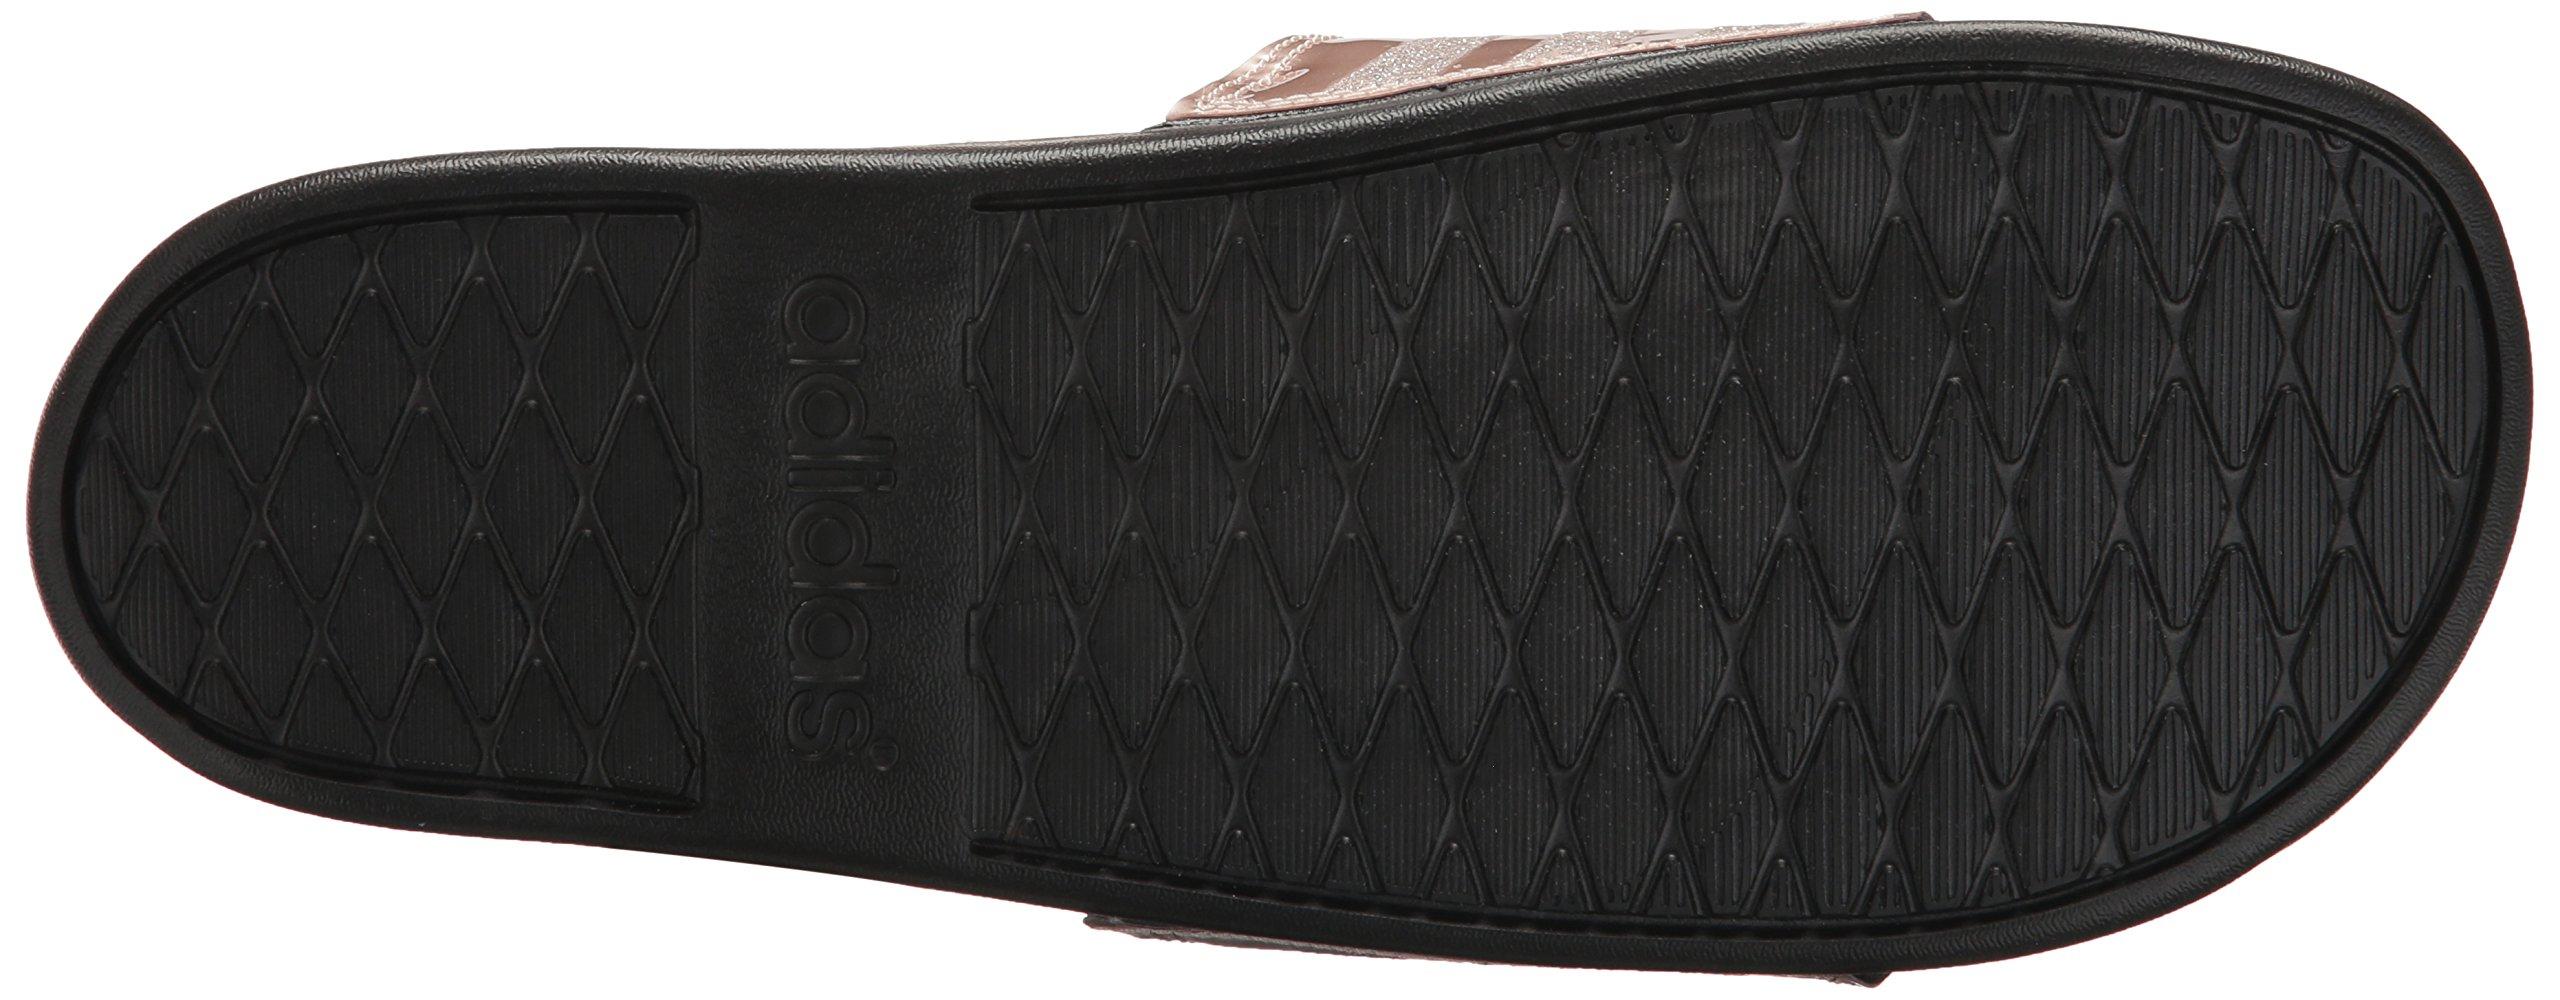 adidas Performance Women's Adilette CF+ Explorer W Sport Sandal, Vapour Grey Met, Vapour Grey Met.Fabric, Core Black, 9 M US by adidas (Image #3)